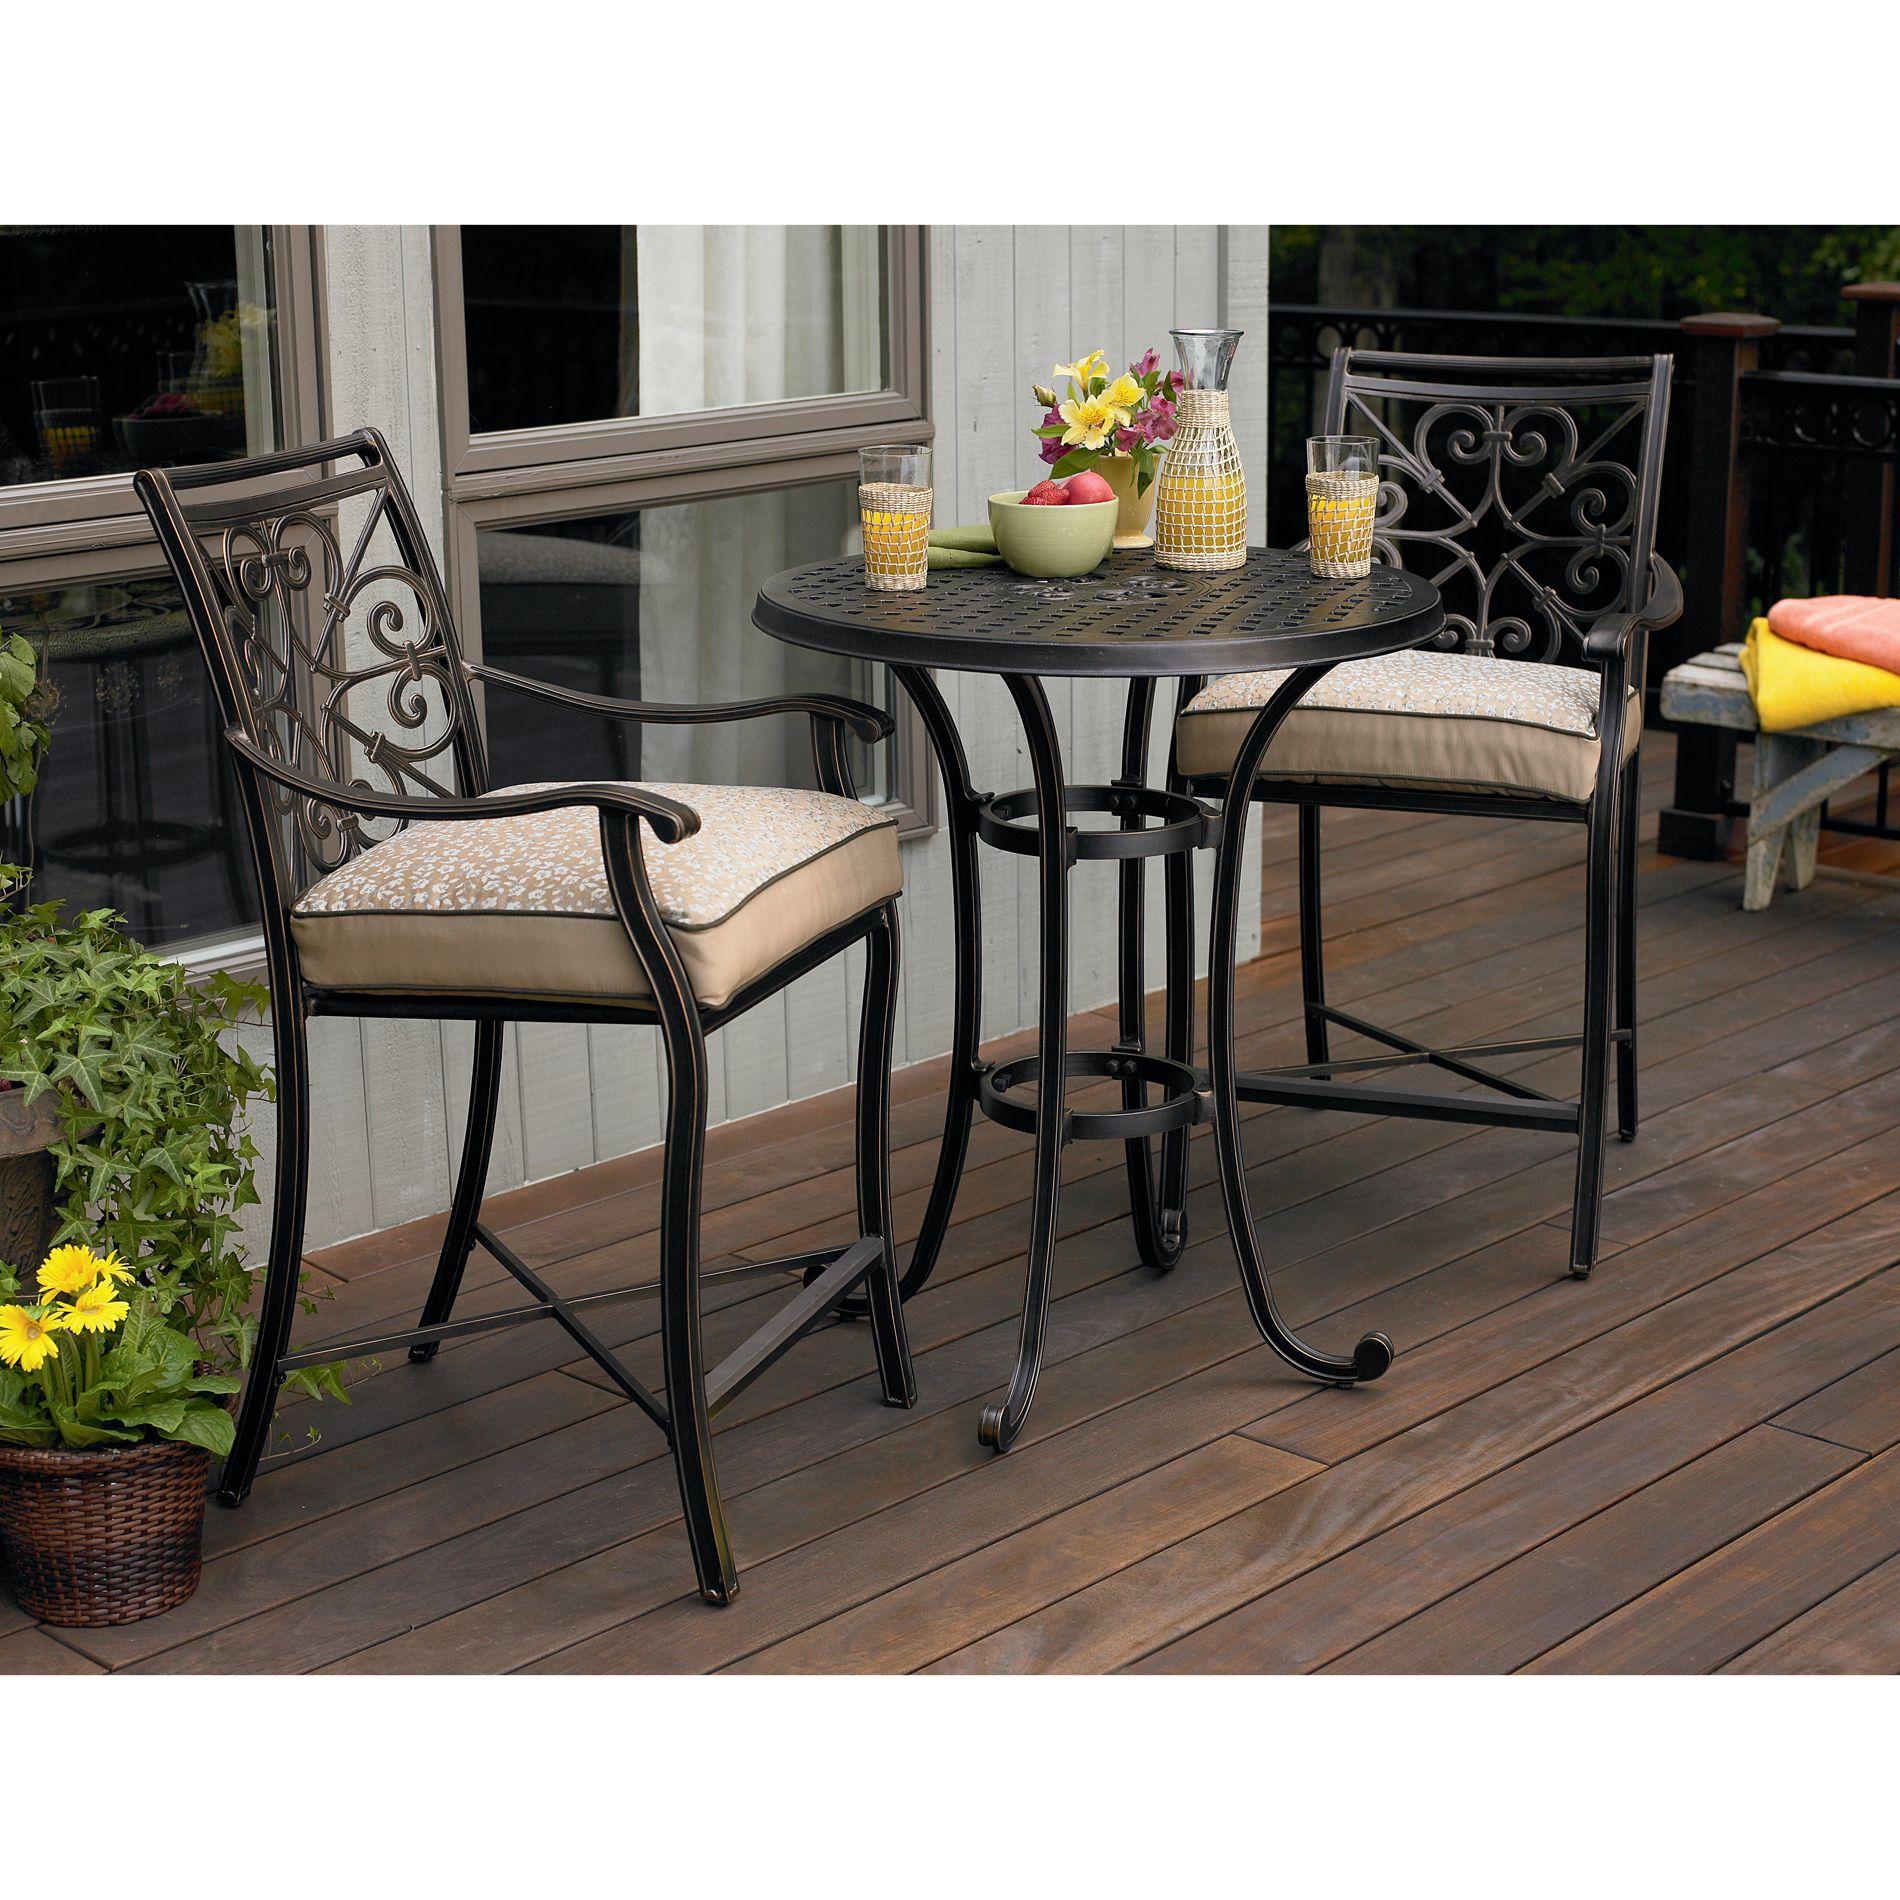 bistro bar sets outdoor furniture photo - 2